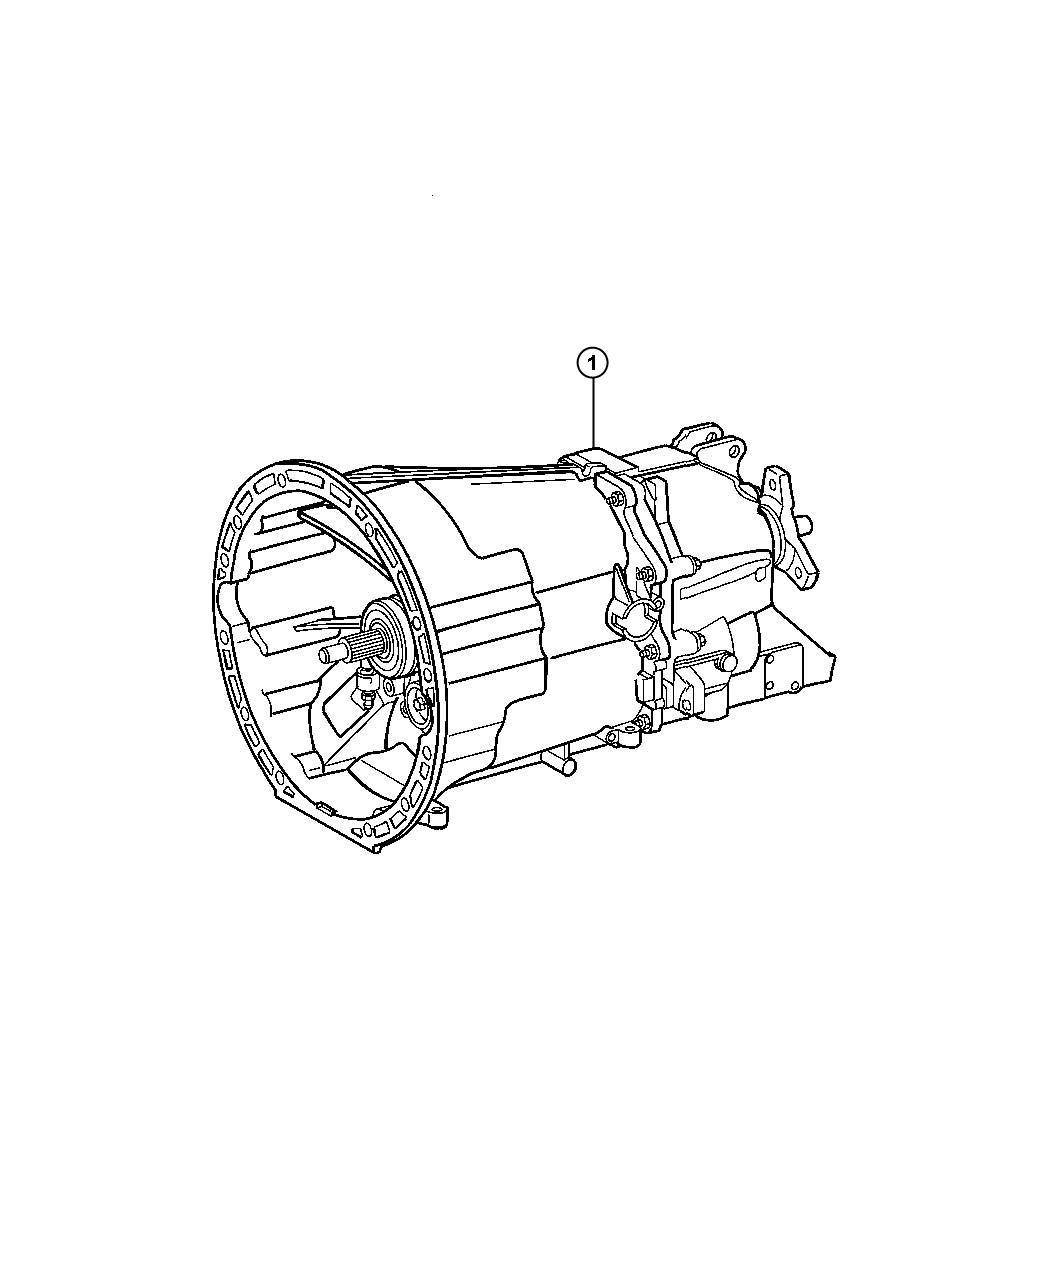 Jeep Wrangler Transmission. Nsg370. Assembly - RL050145AA ...